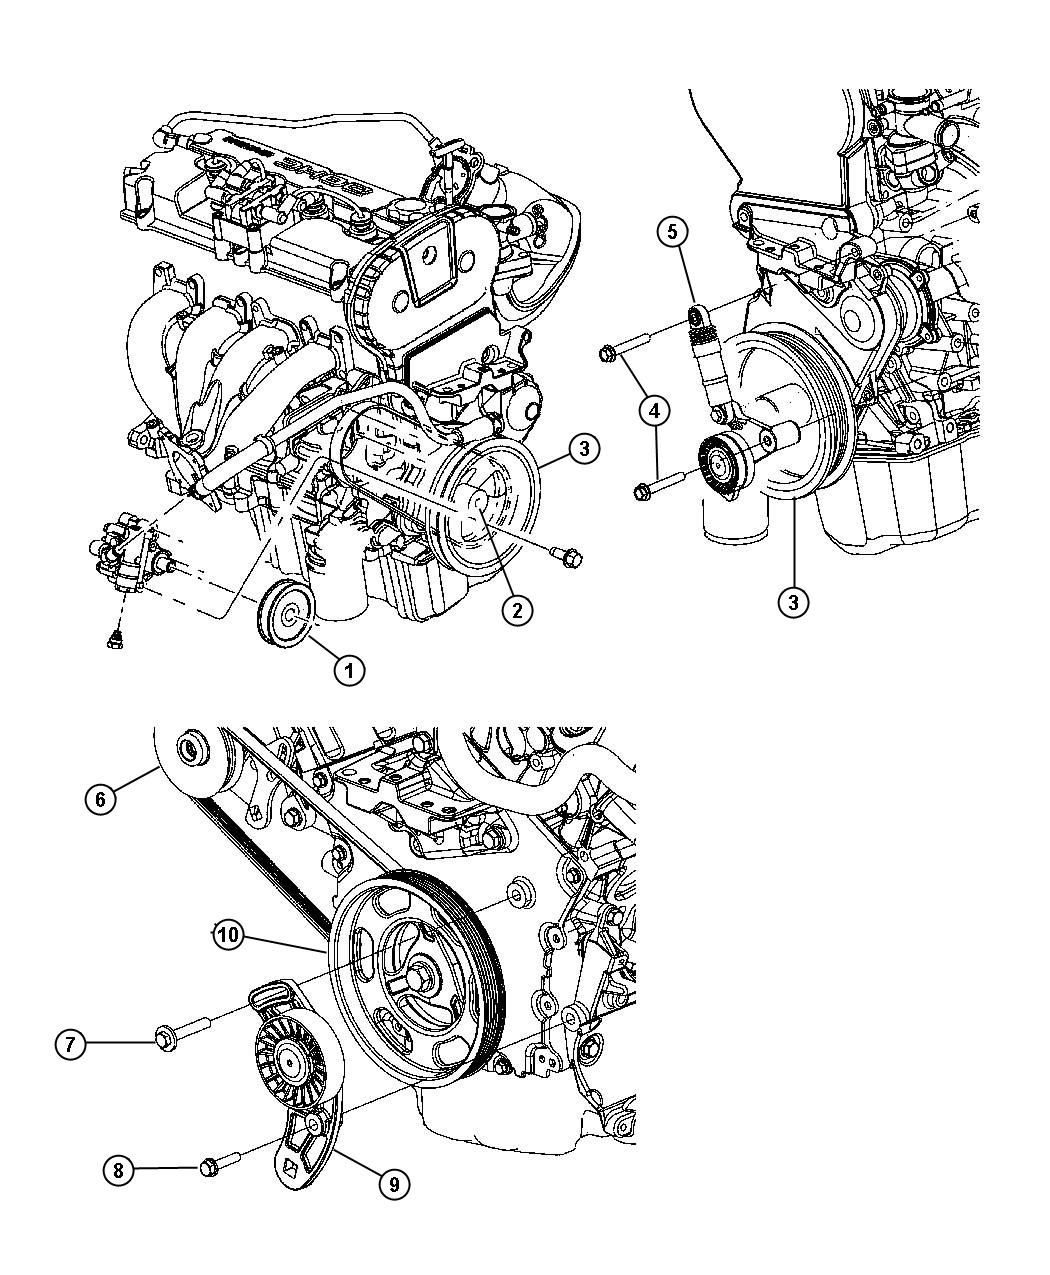 2004 chrysler sebring 2.7l engine diagram